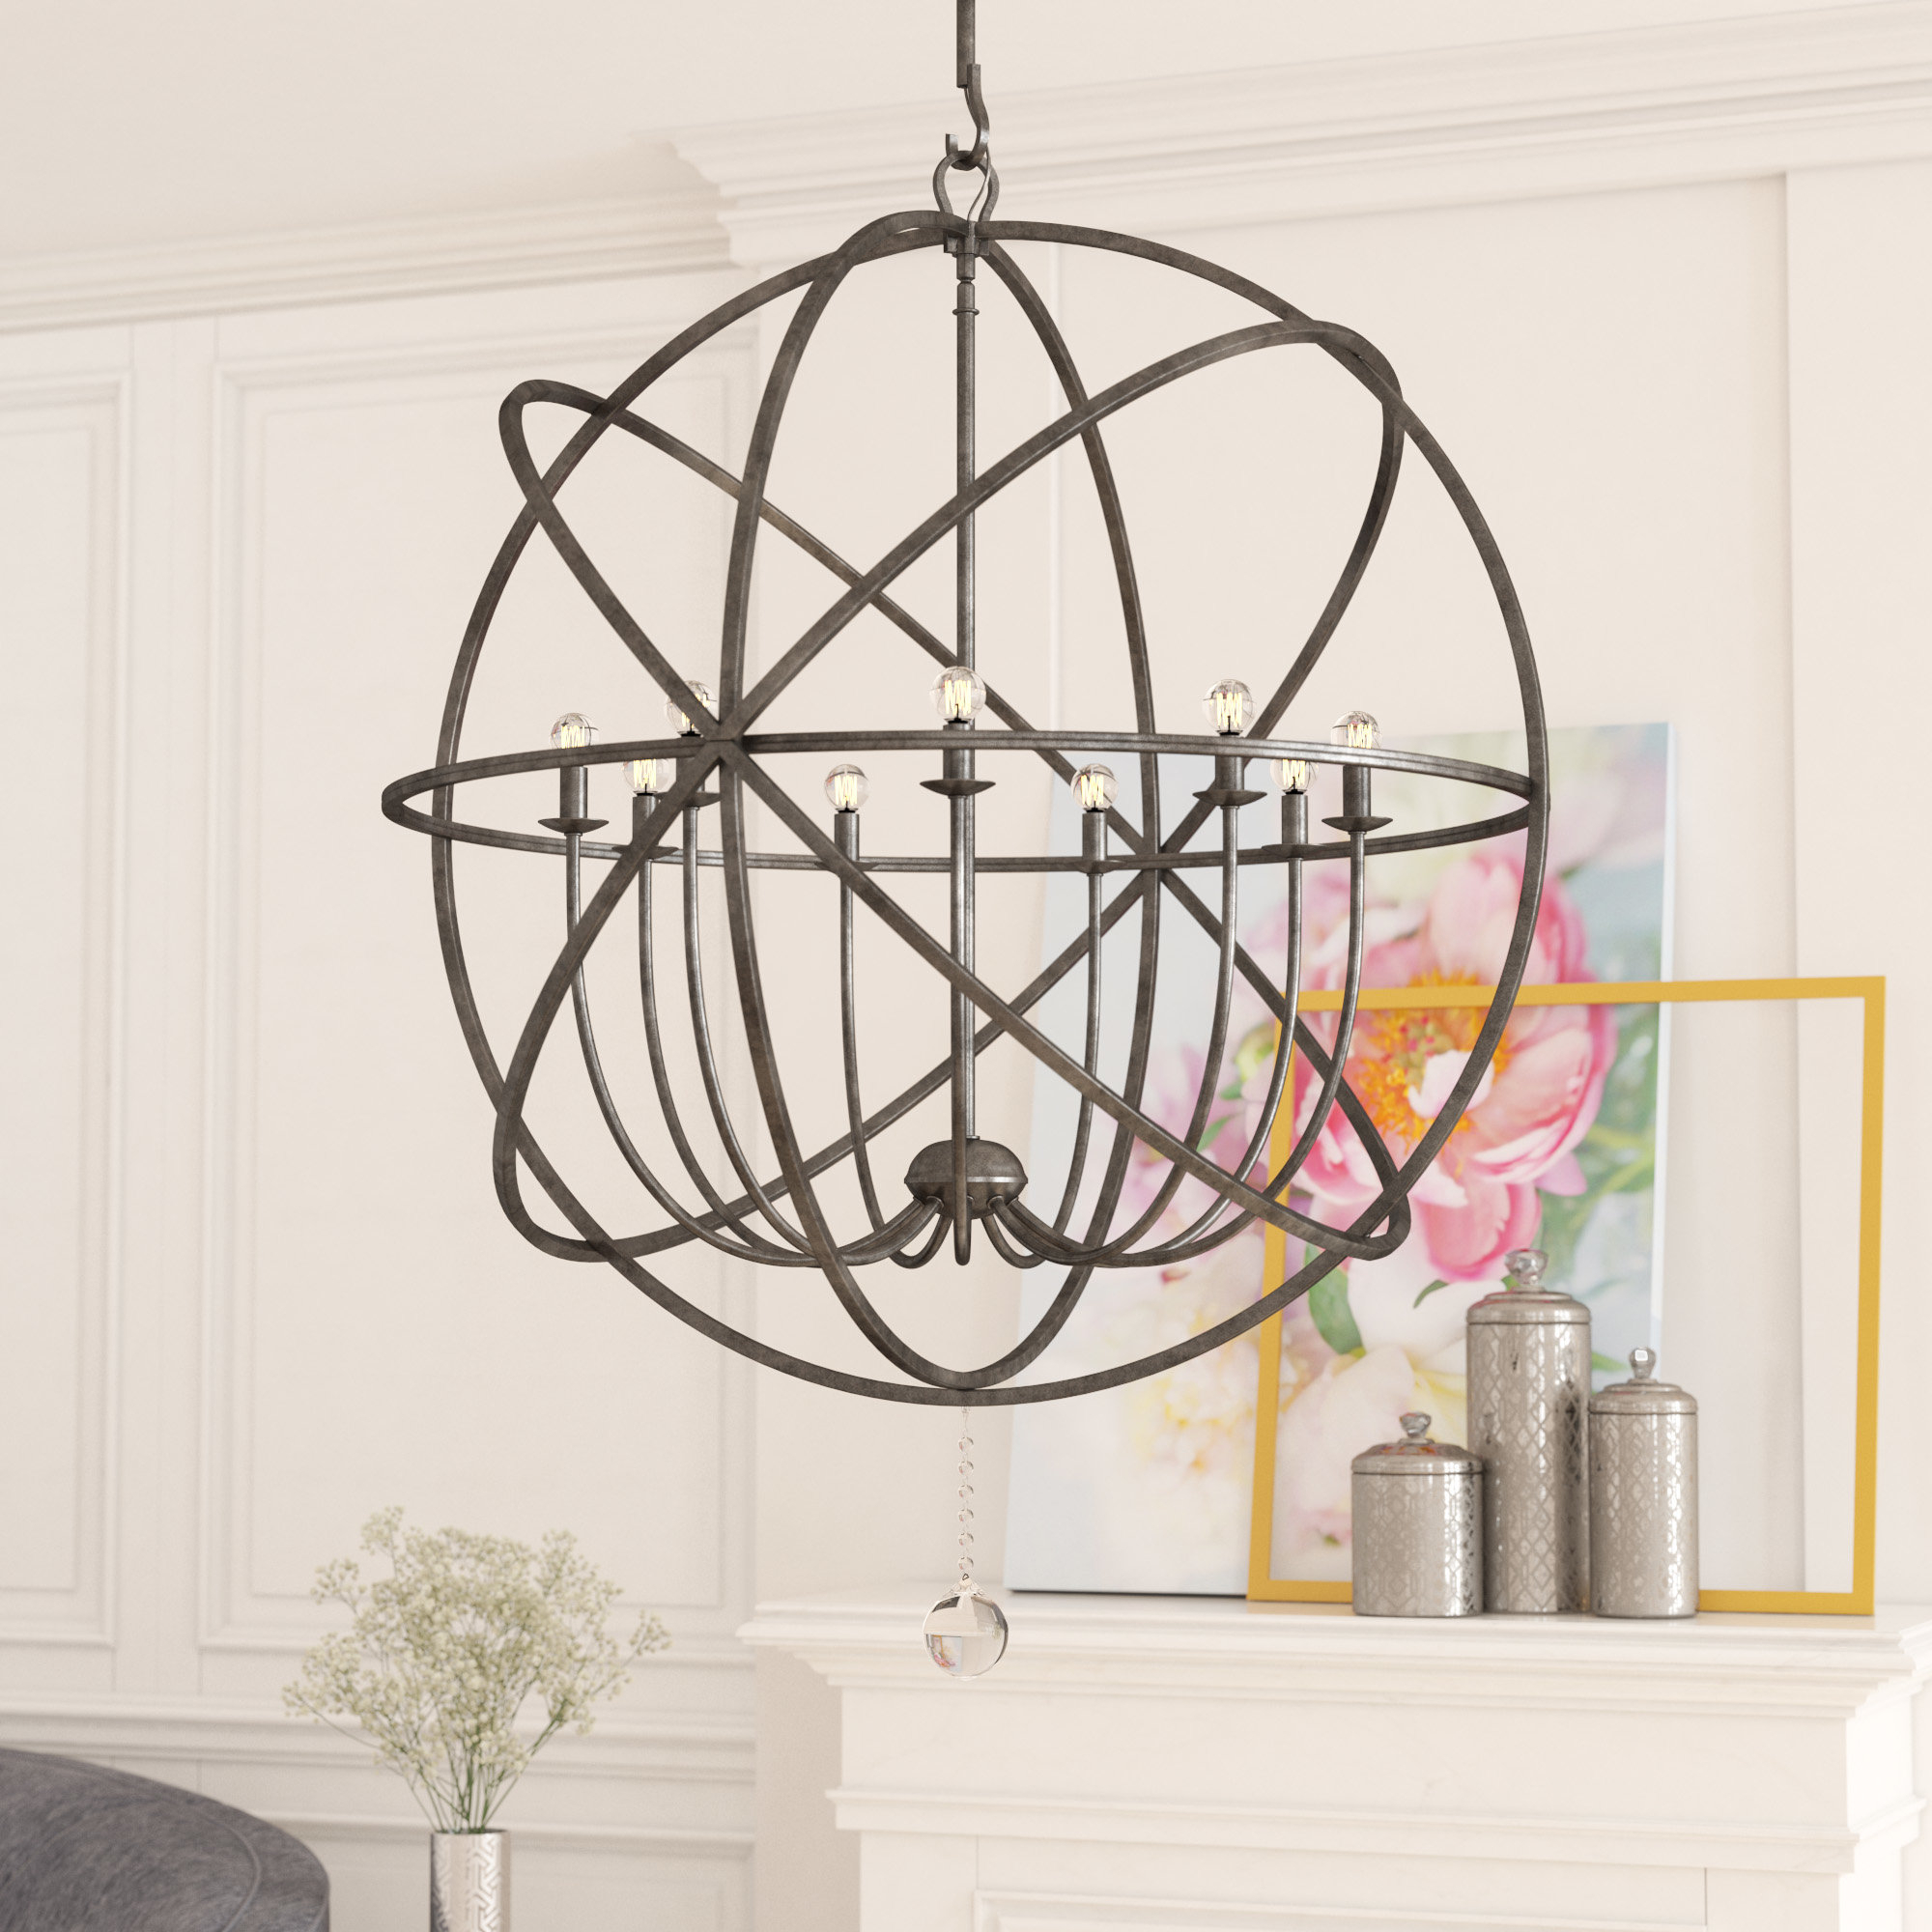 Gregoire 9 Light Globe Chandelier Throughout Most Current Gregoire 6 Light Globe Chandeliers (View 15 of 25)